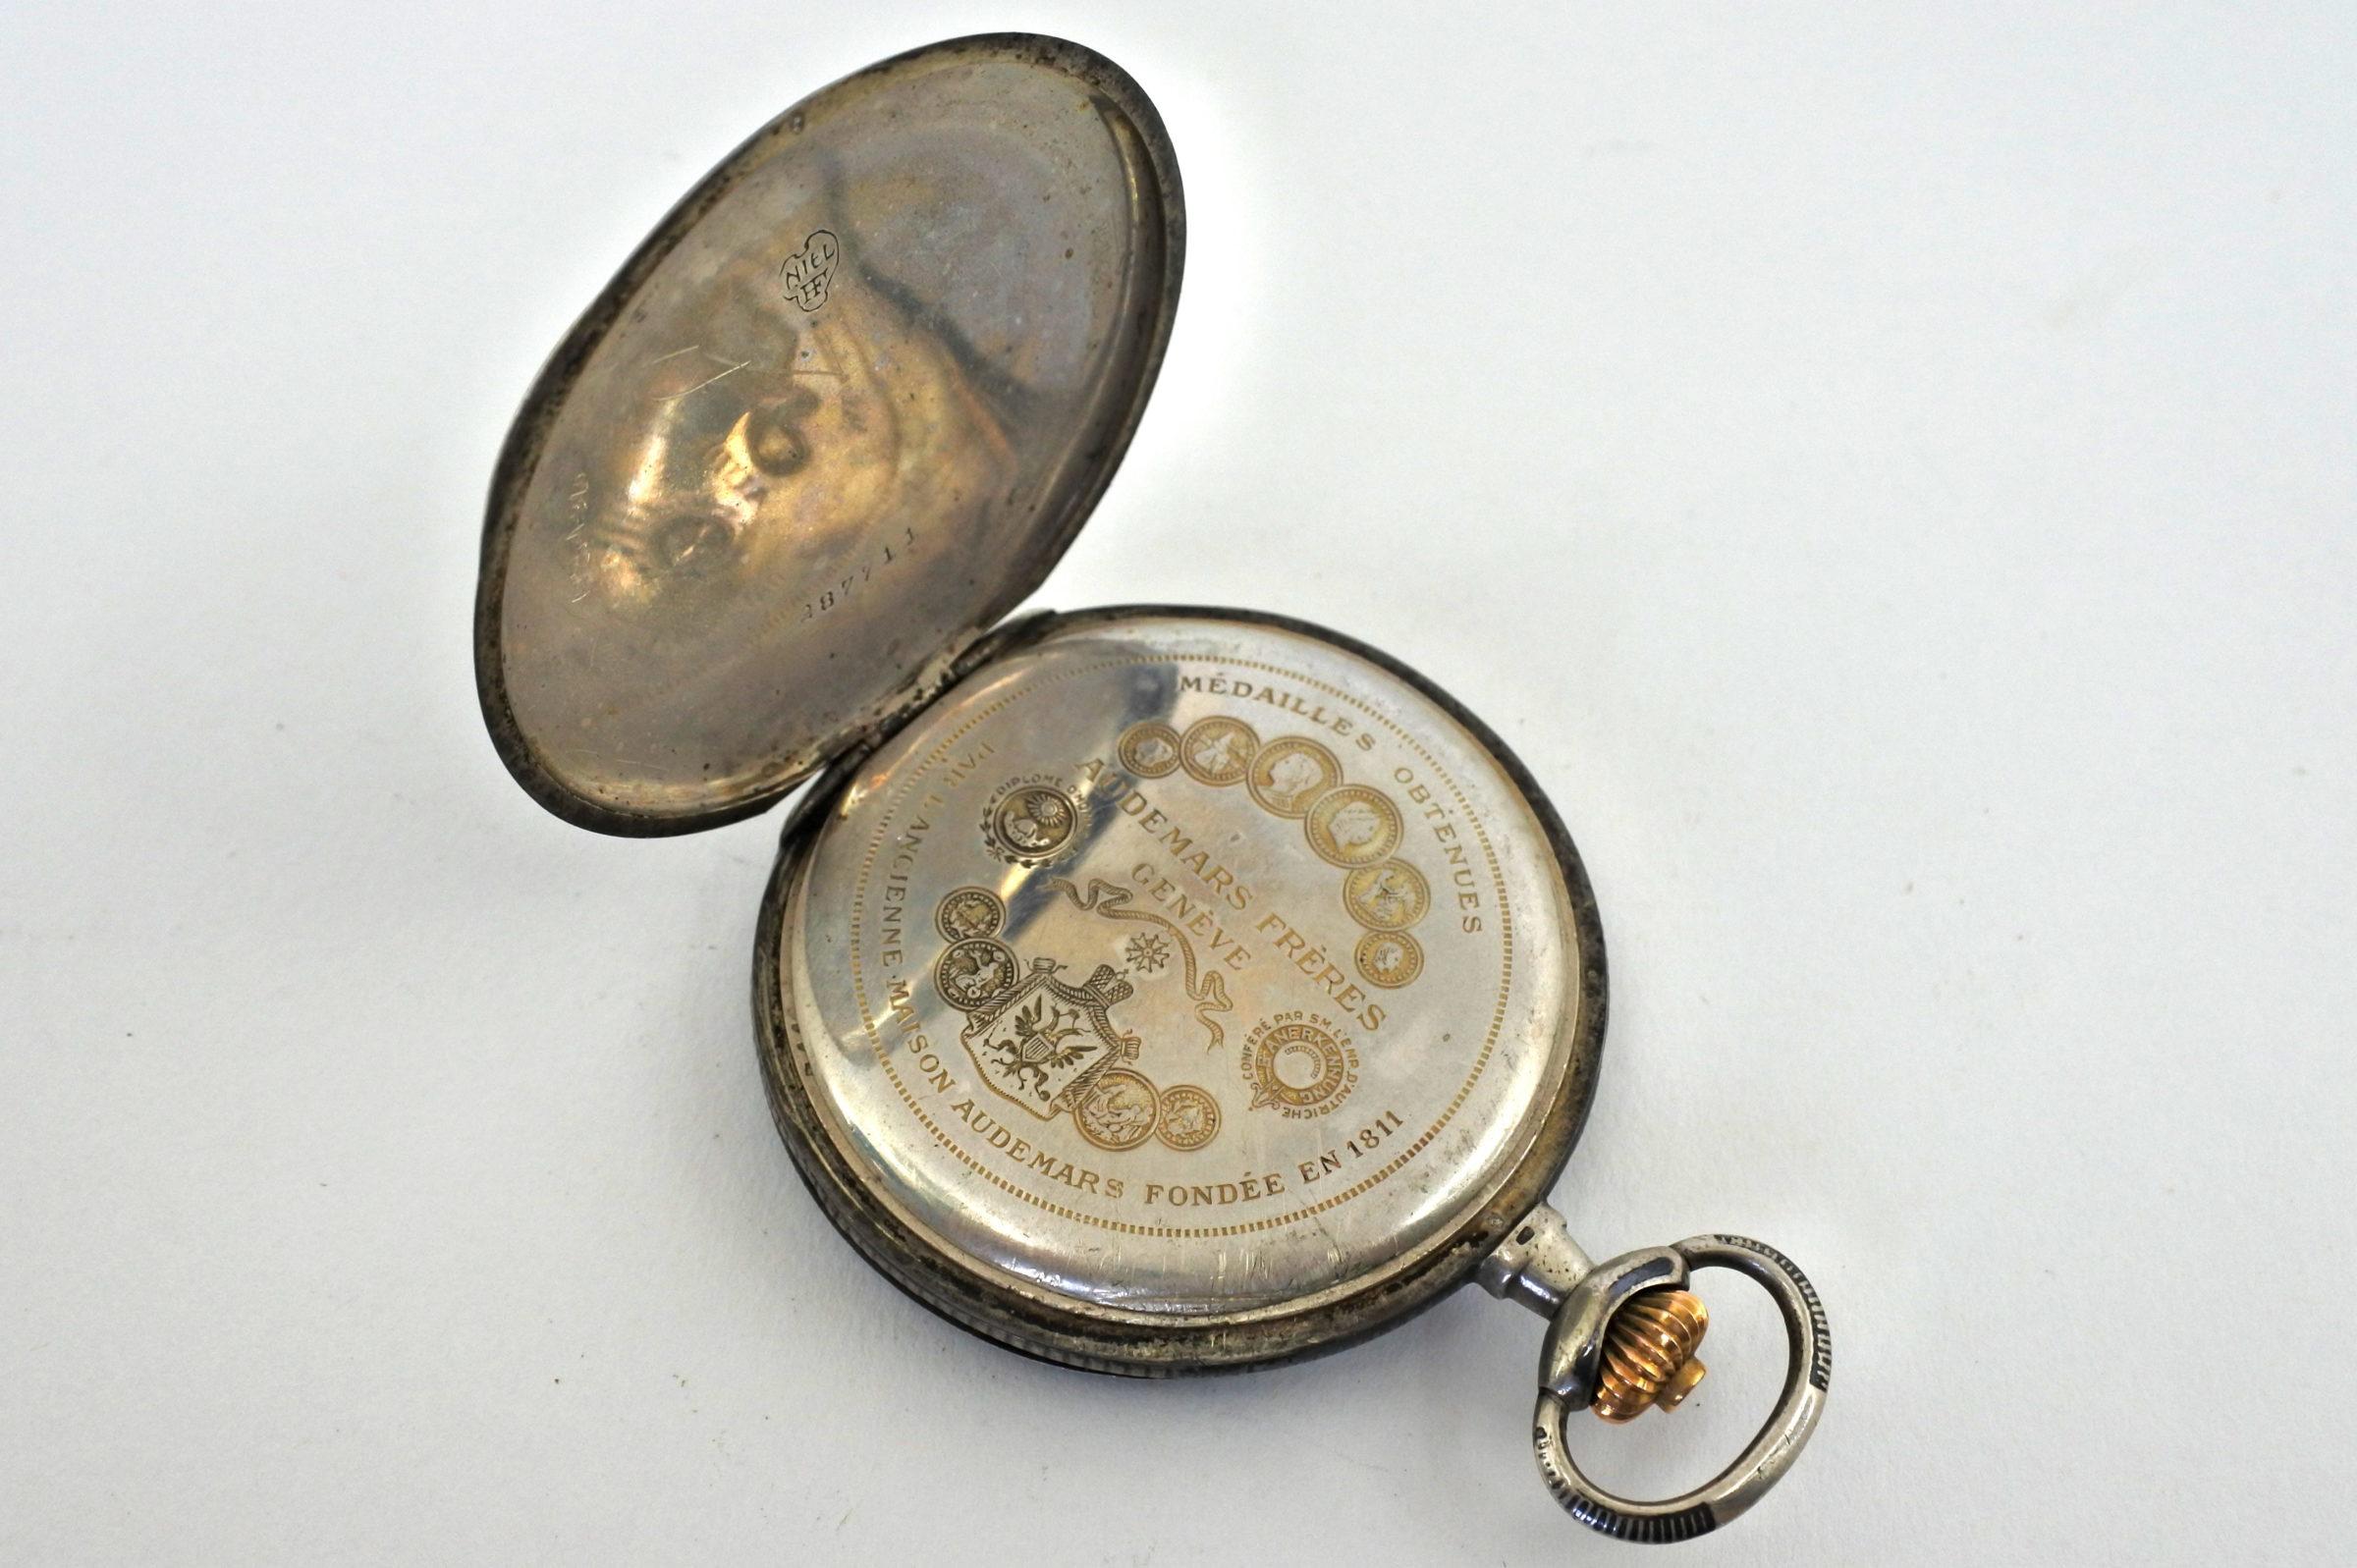 Orologio da tasca in argento e niello – Audemars Piguet Genève - 3